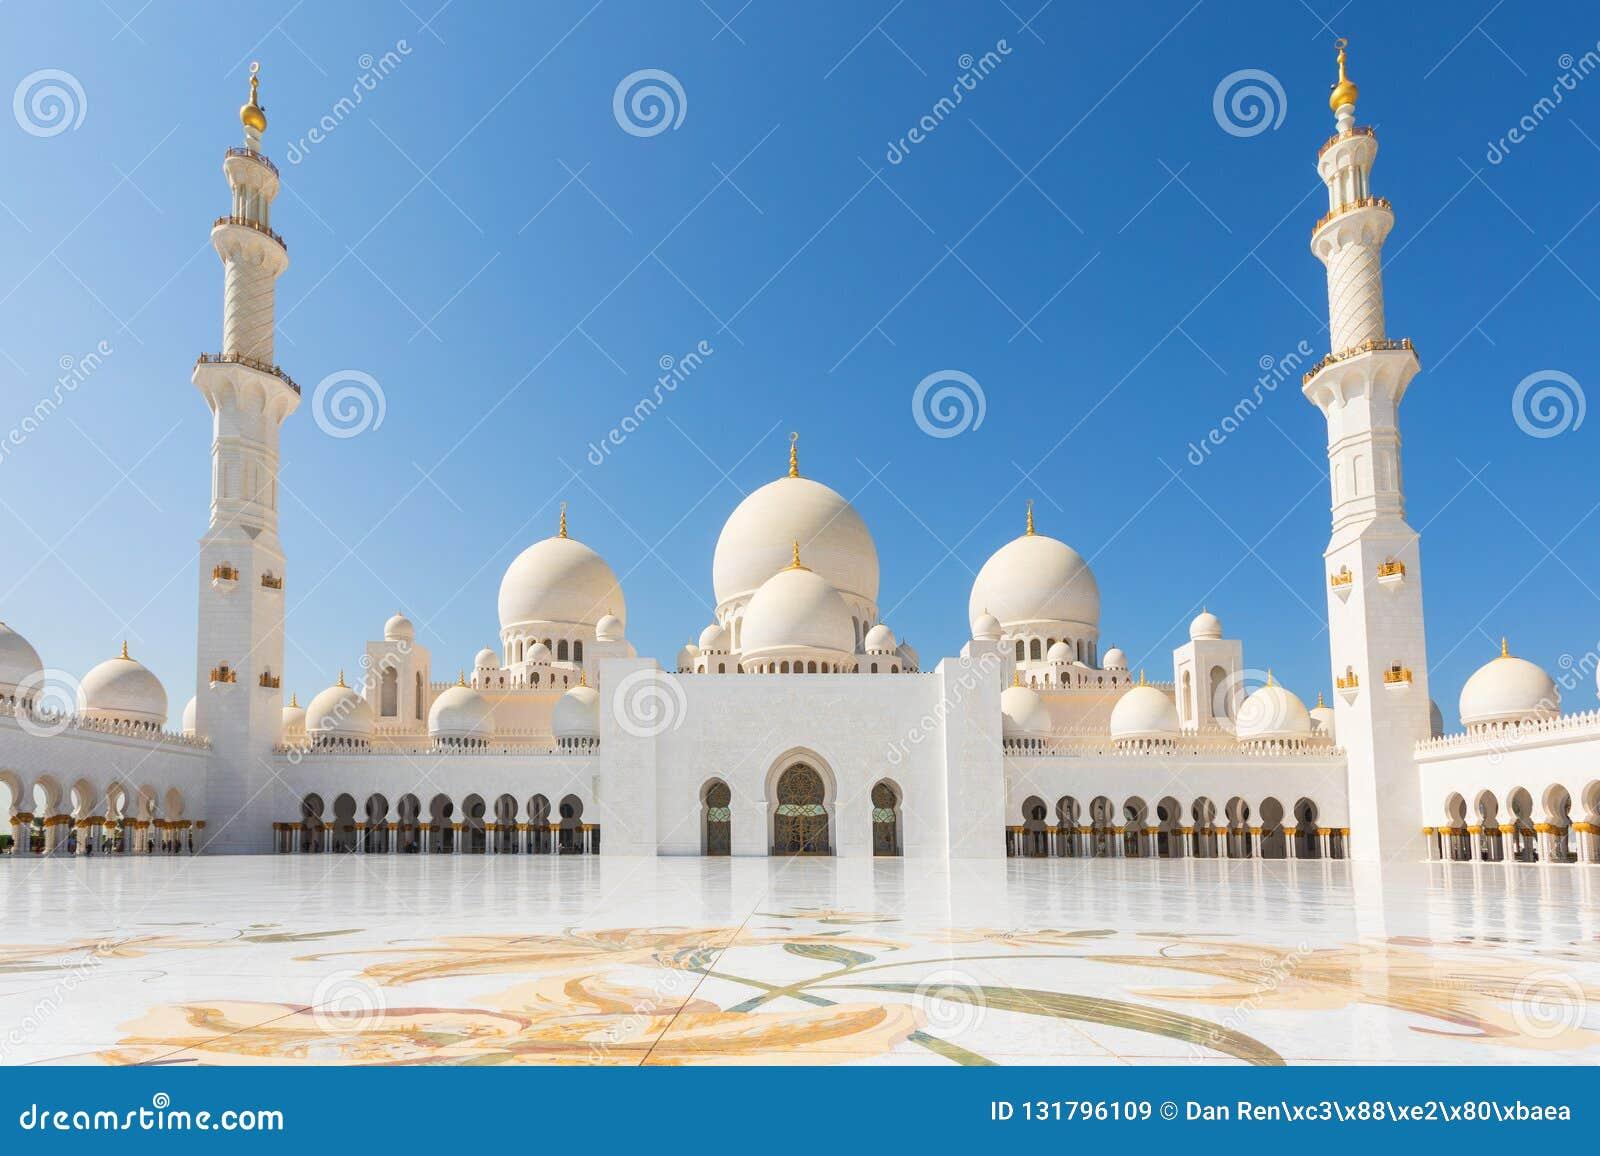 Sheikh Zayed Mosque - Abu Dhabi, Emirats Arabes Unis Belle cour grande blanche de mosquée